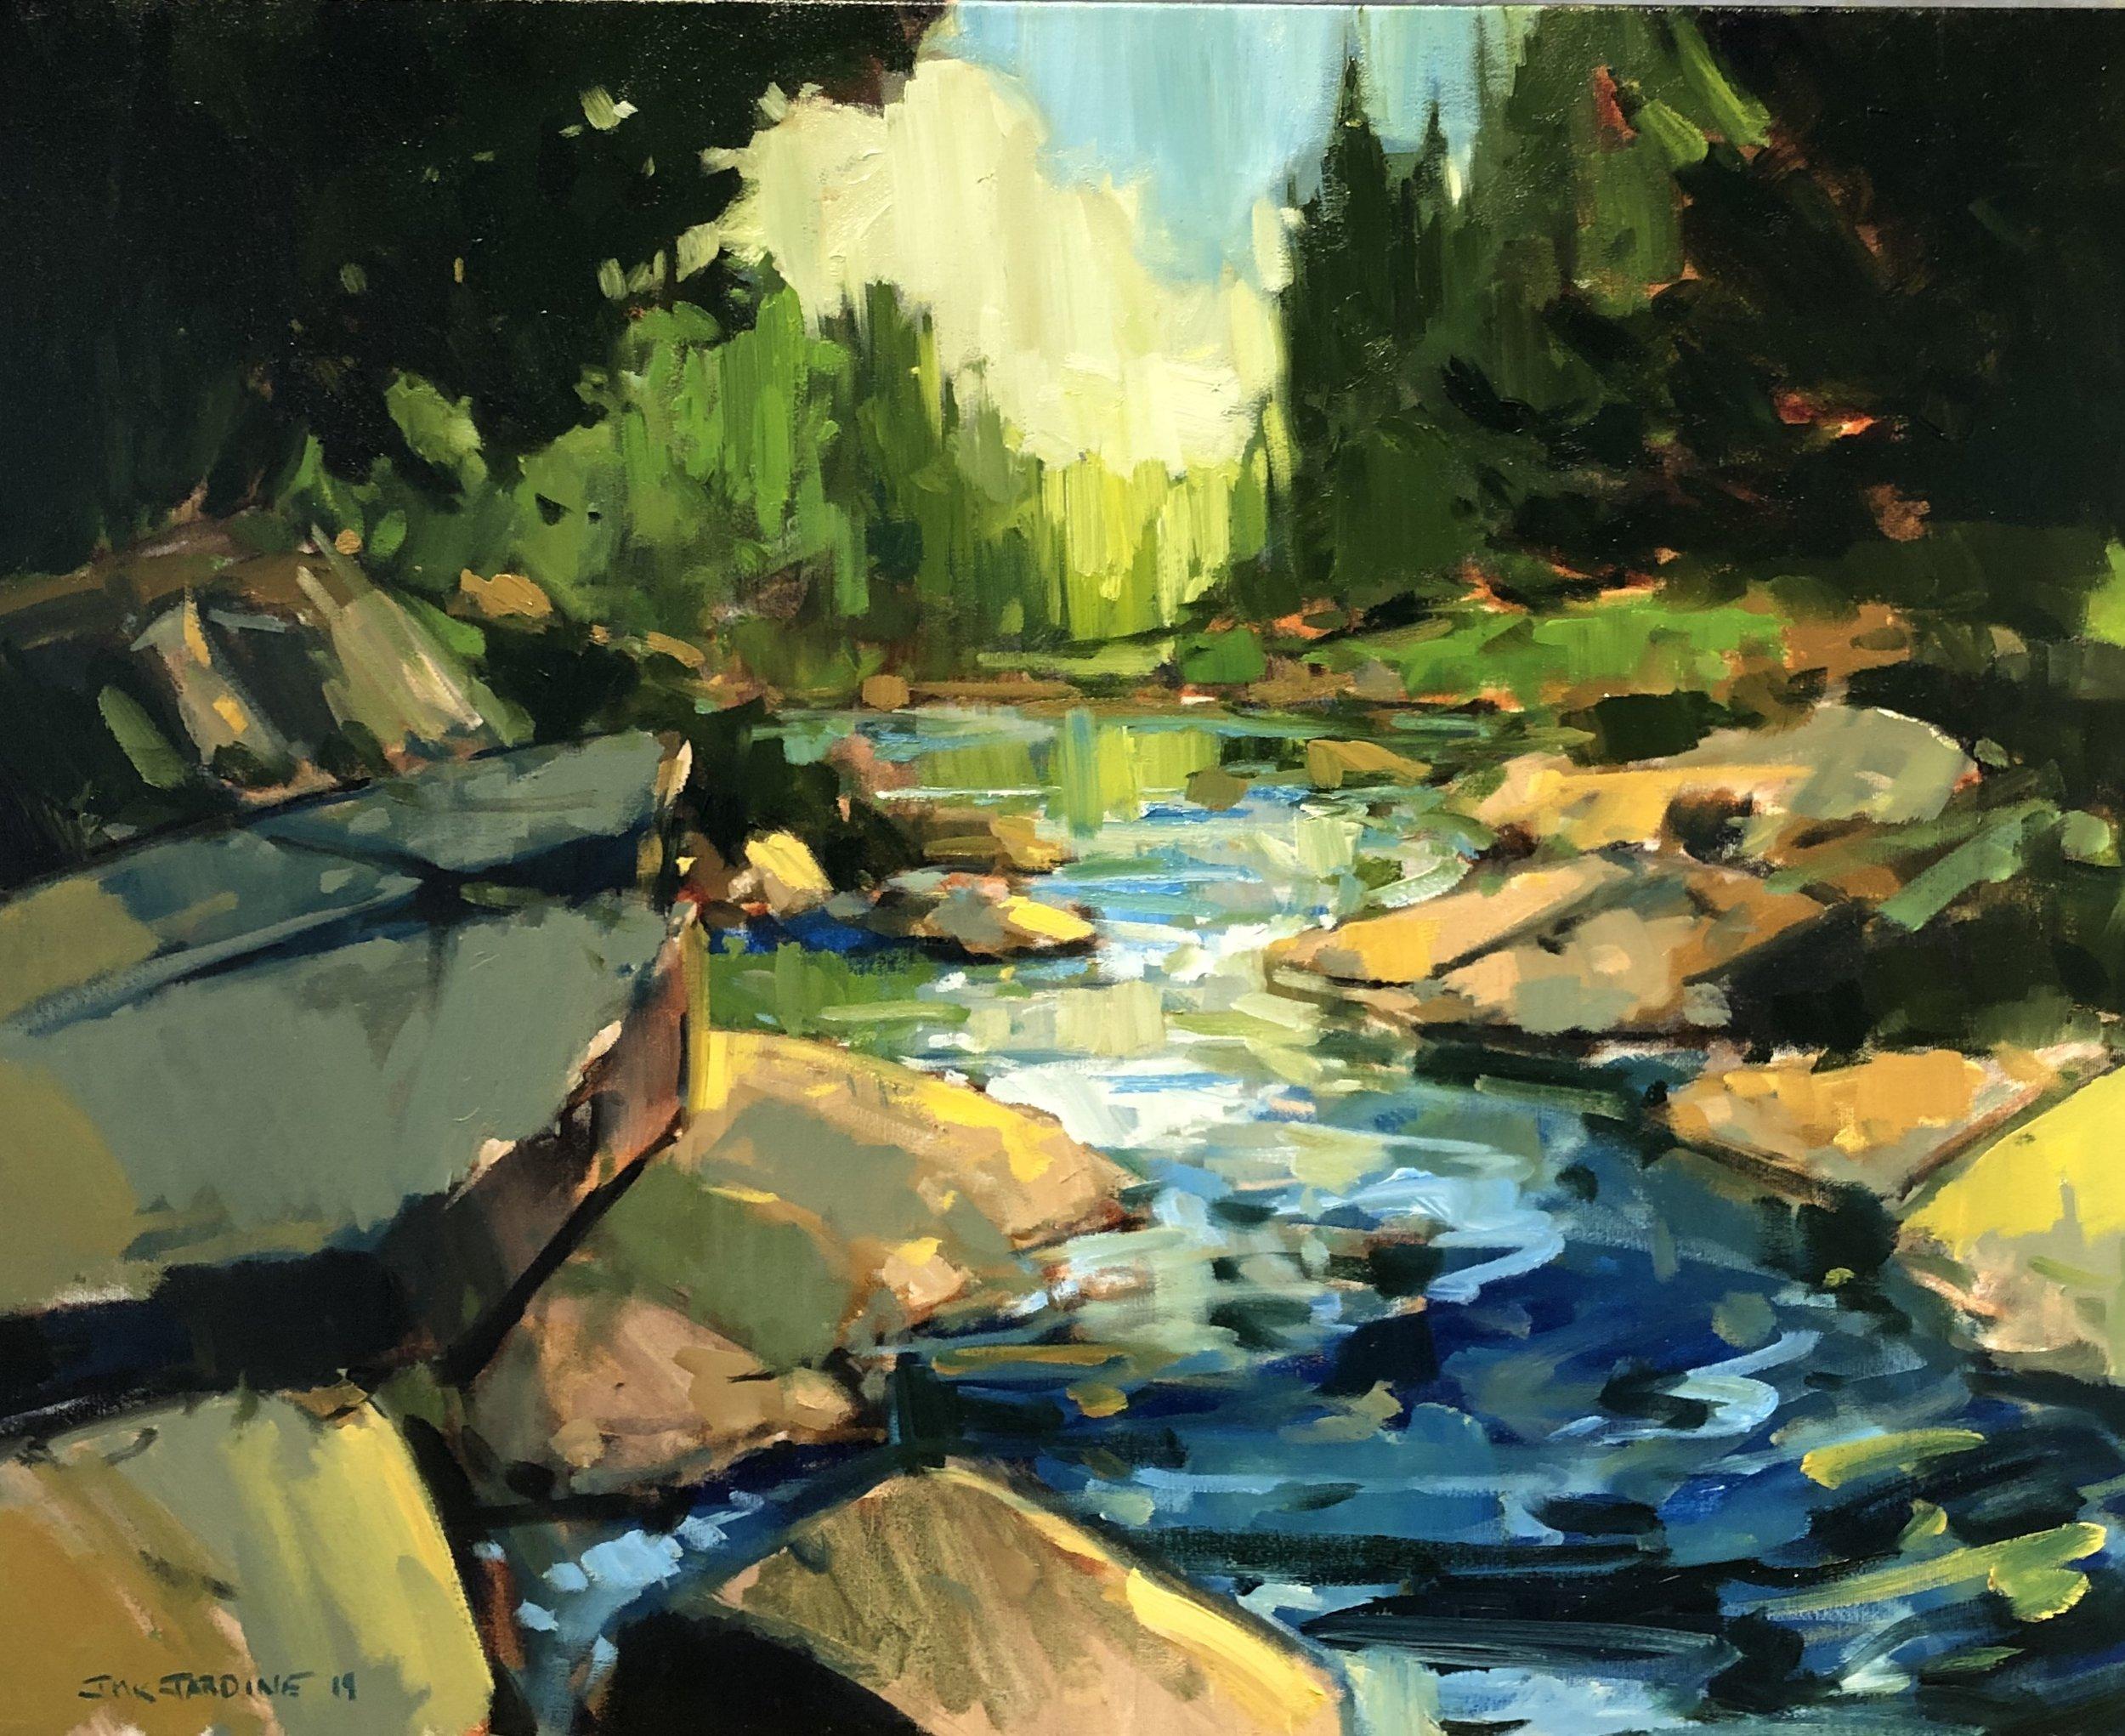 Alon g the Magnetawan River by Jamie Jardine